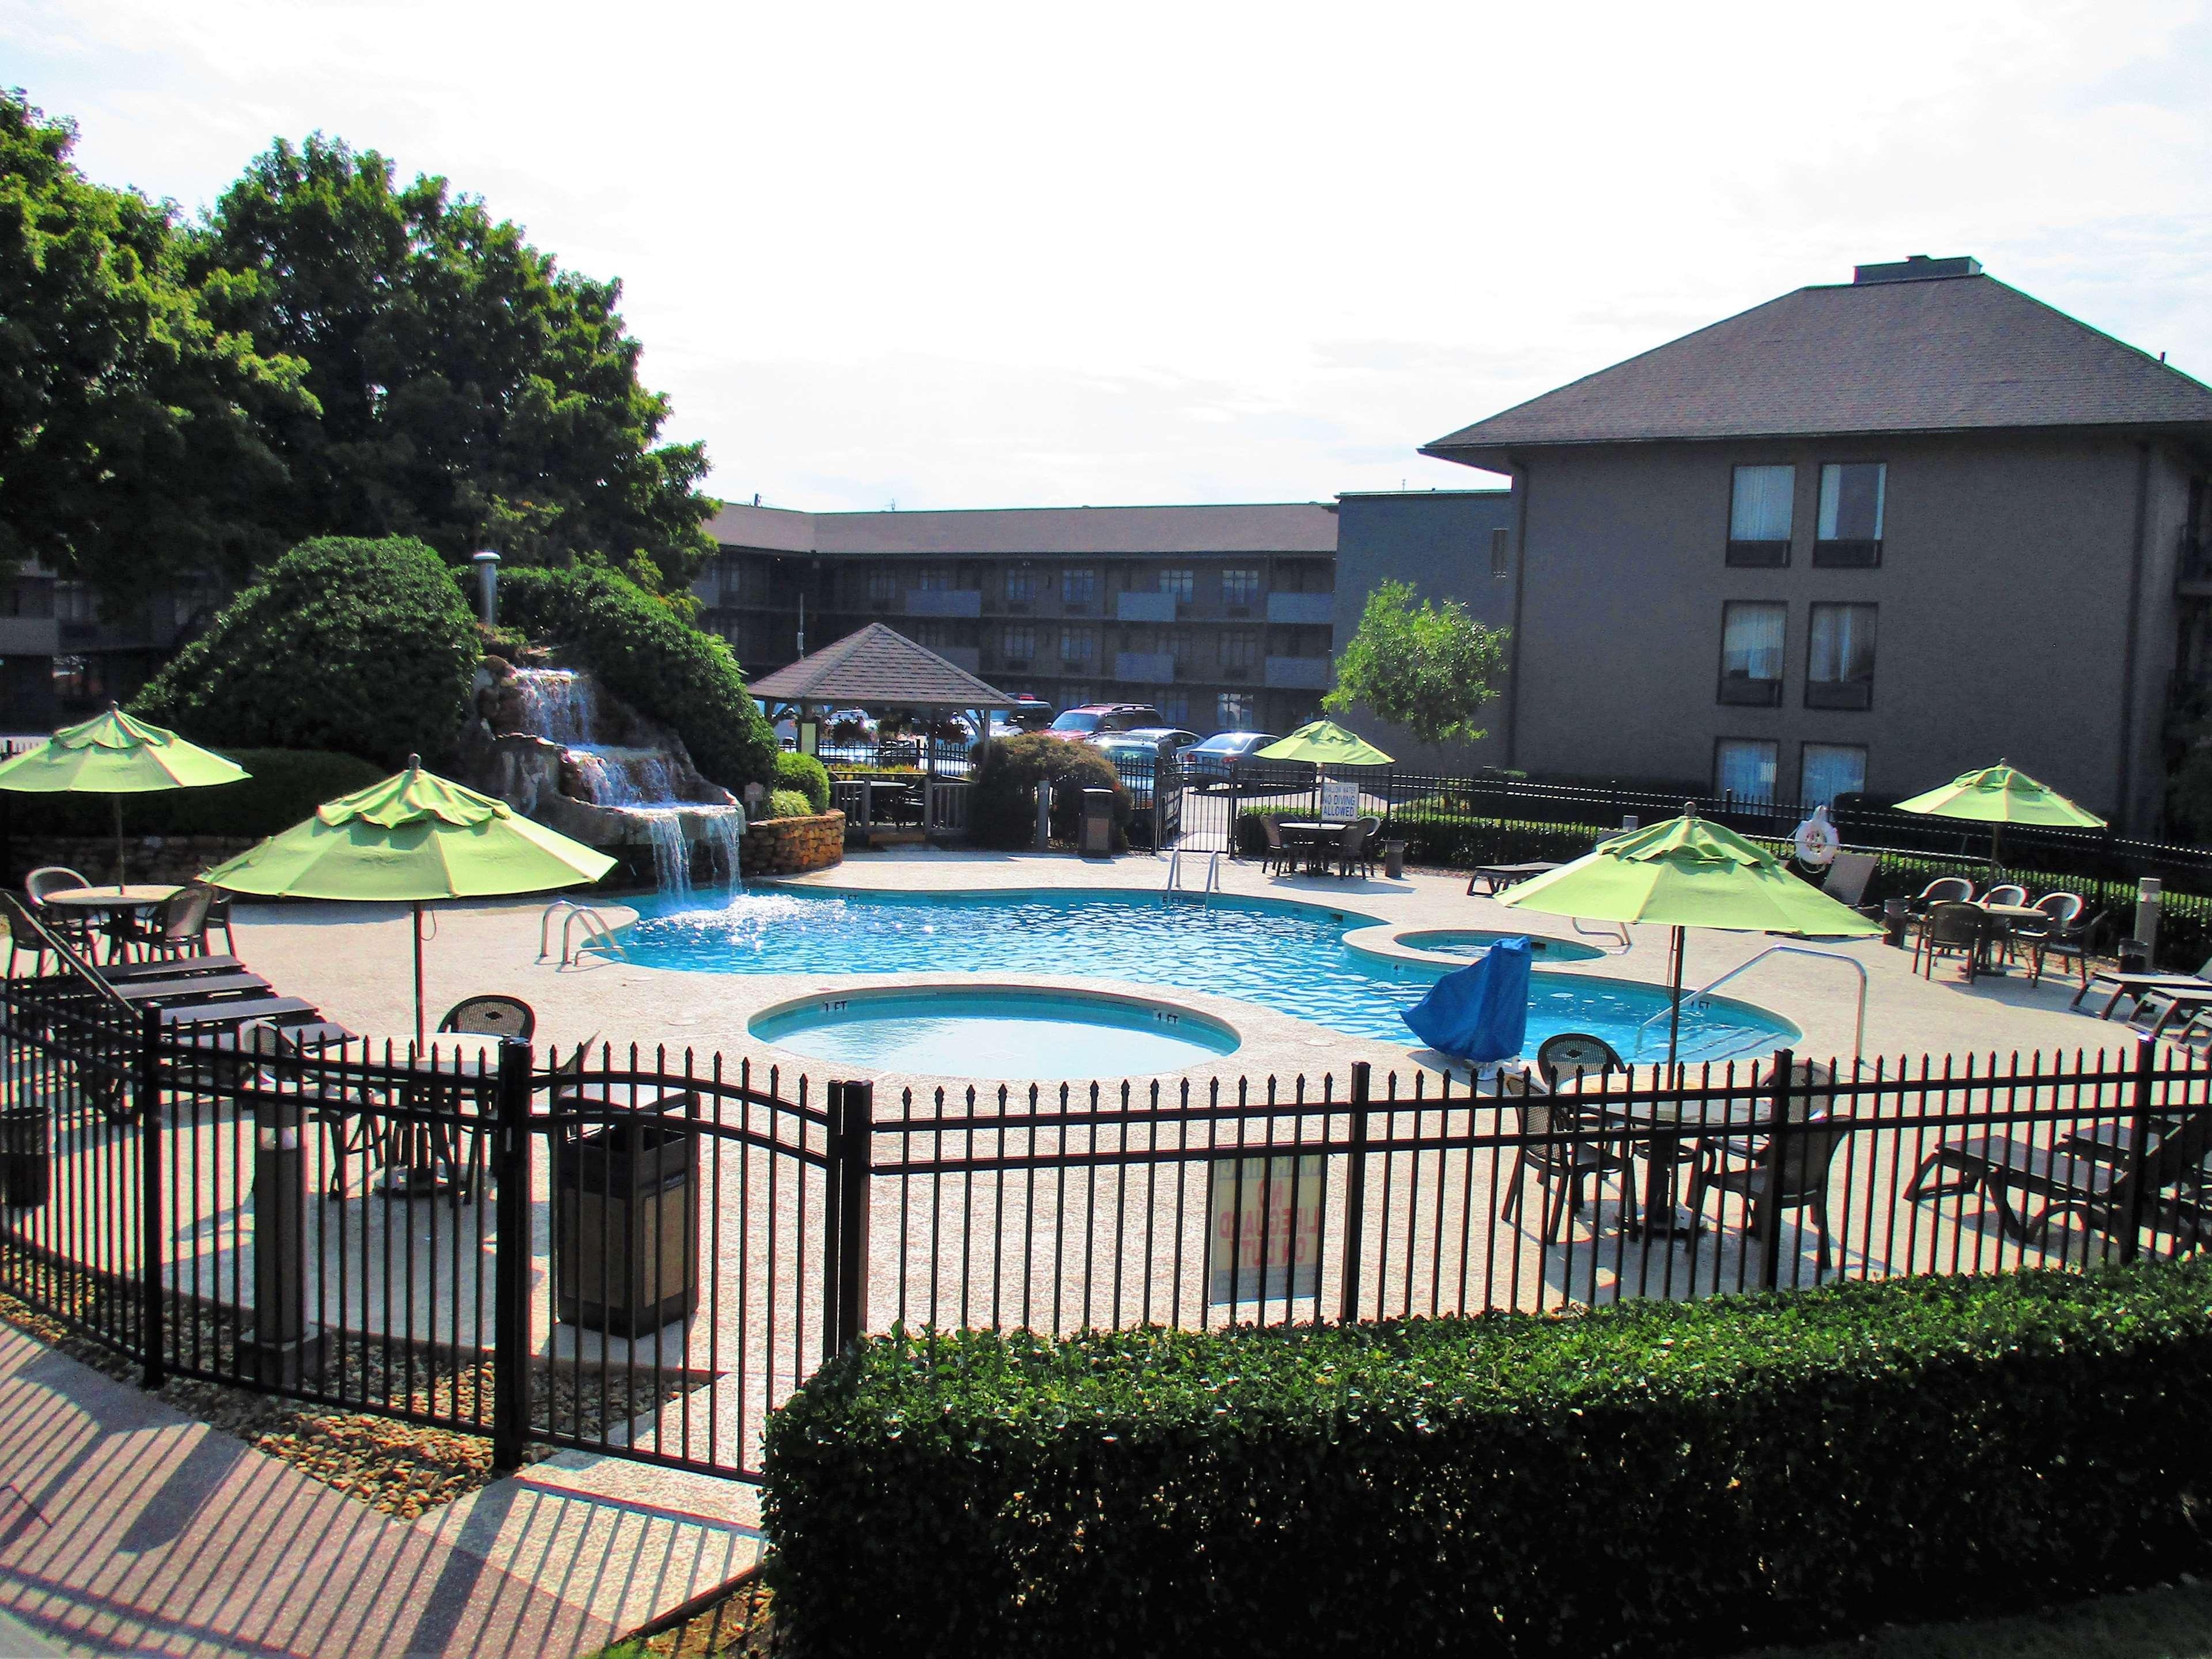 Best Western Plaza Inn Pigeon Forge Tennessee Tn